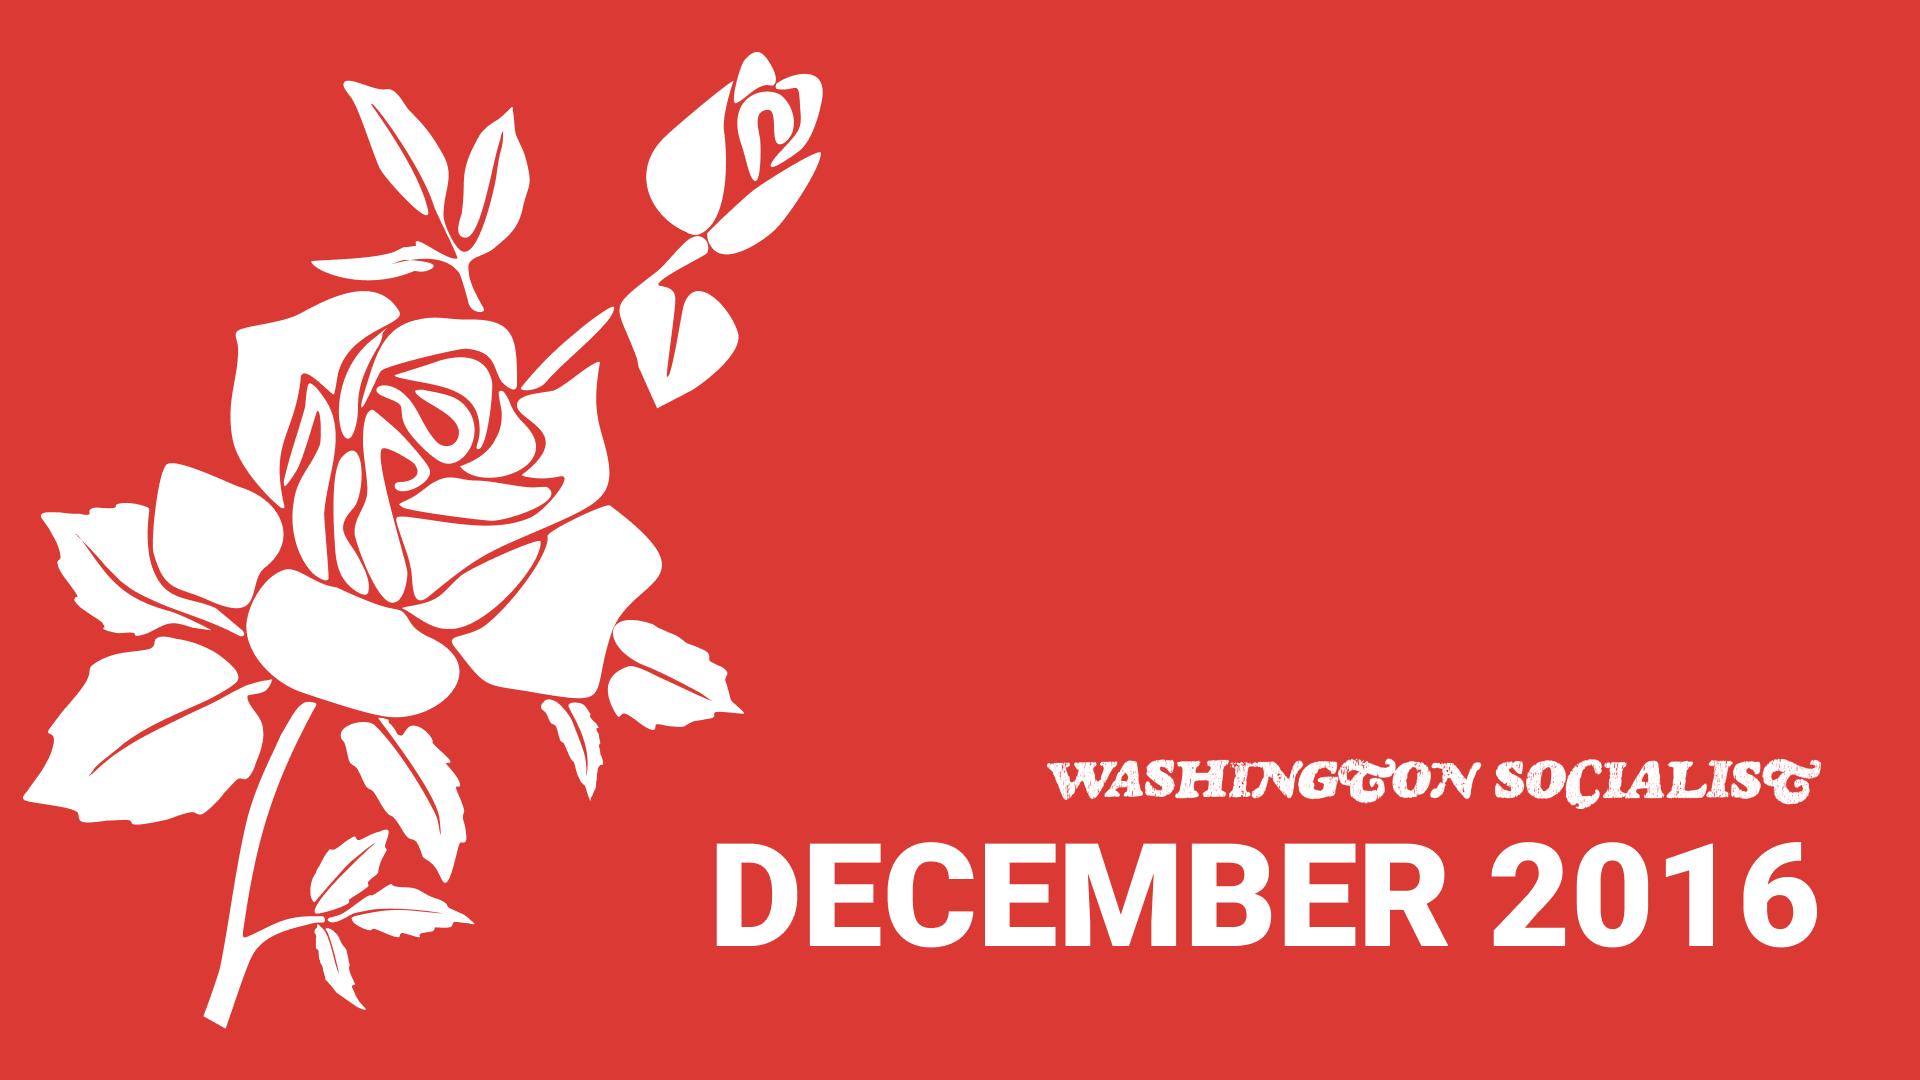 December 2016 Banner